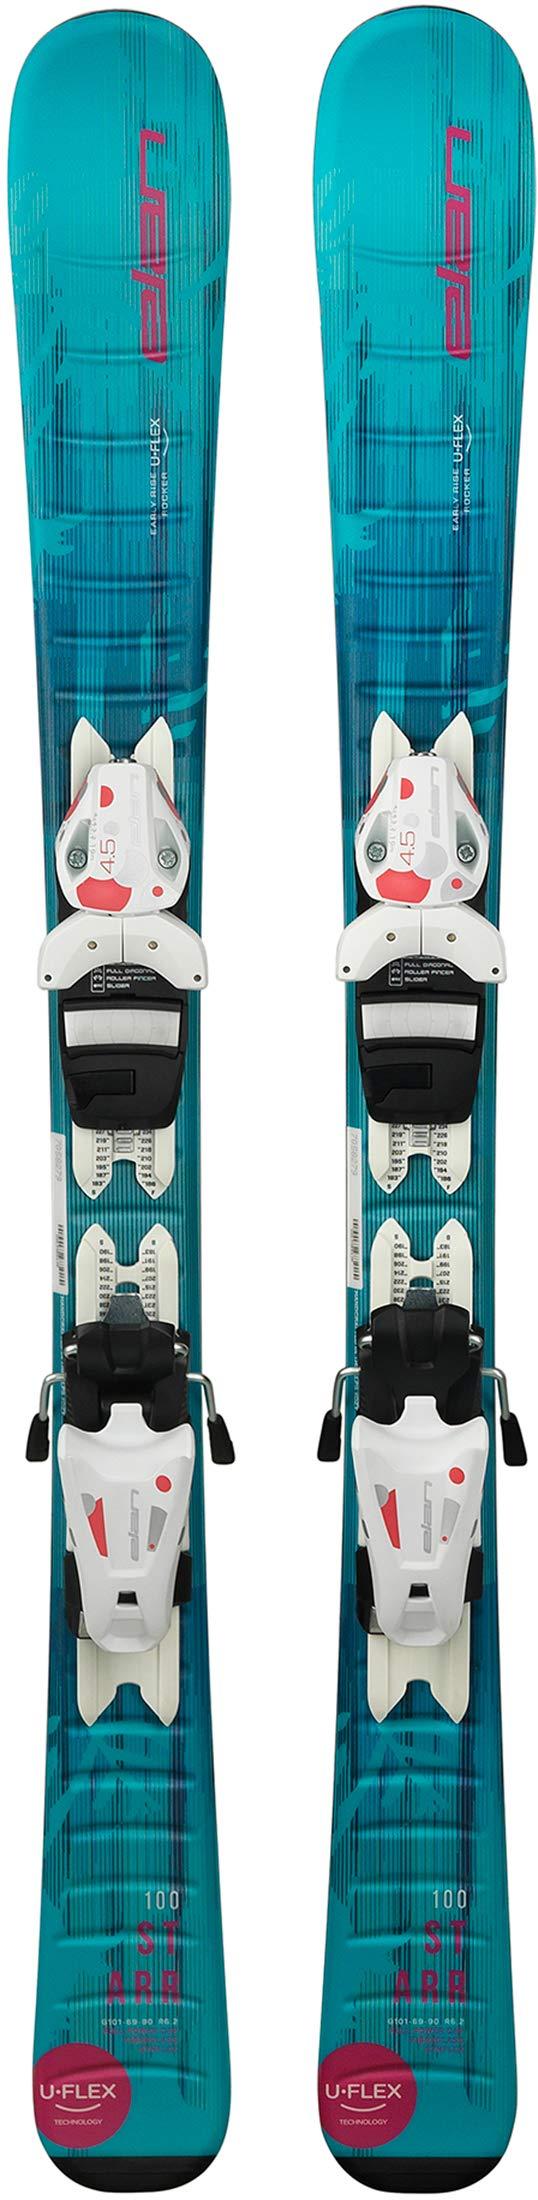 Elan Starr QS Ski with EL 4.5 AC QS Binding - Kids' One Color, 90cm by Elan